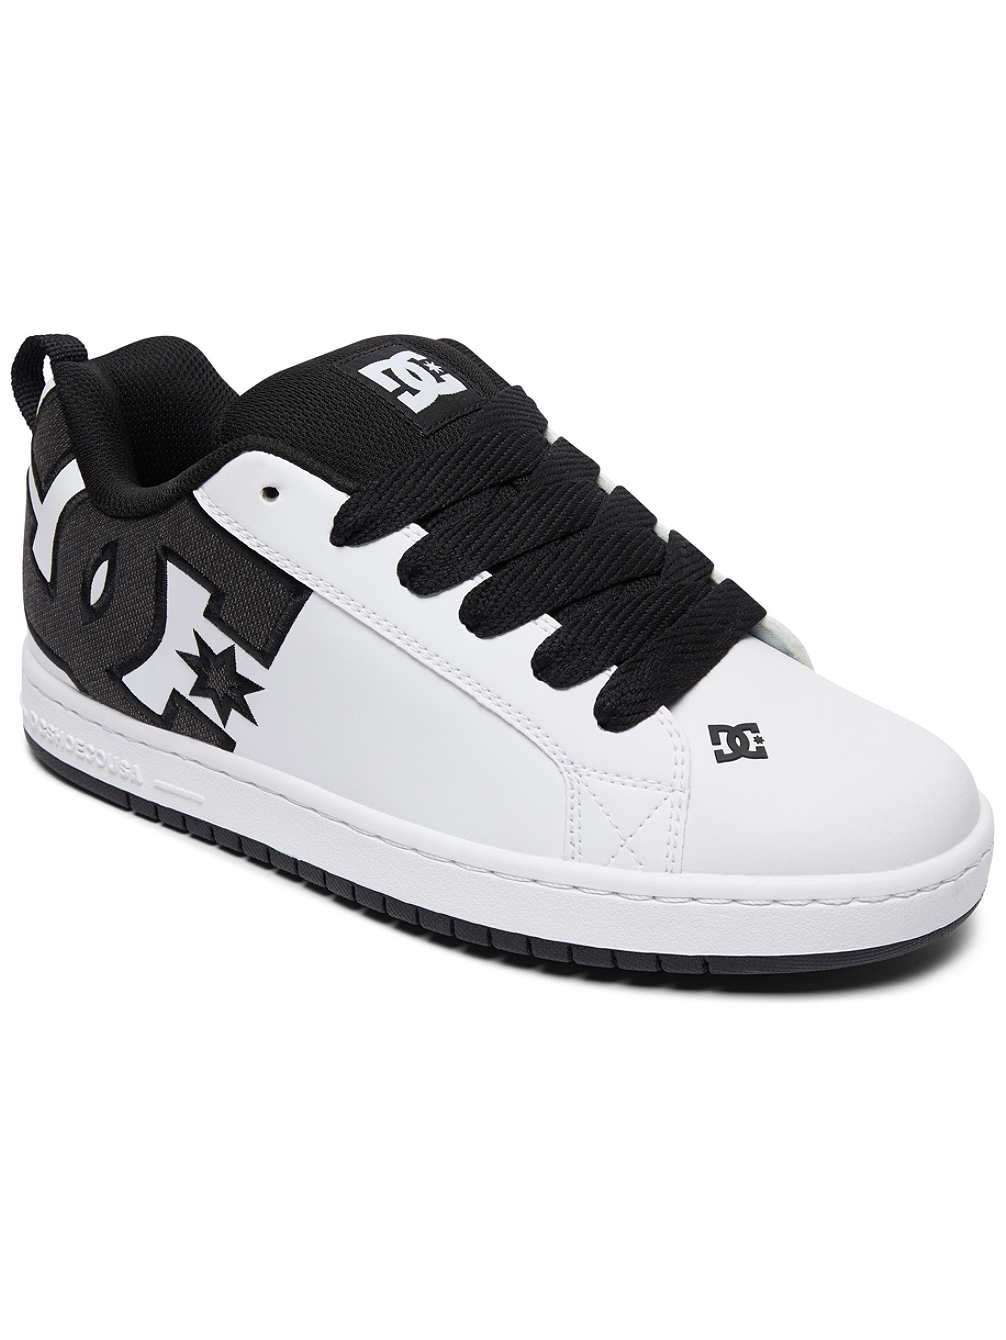 DC Shoes Court Graffik SE, Zapatillas para Hombre 12 UK Black/White/White